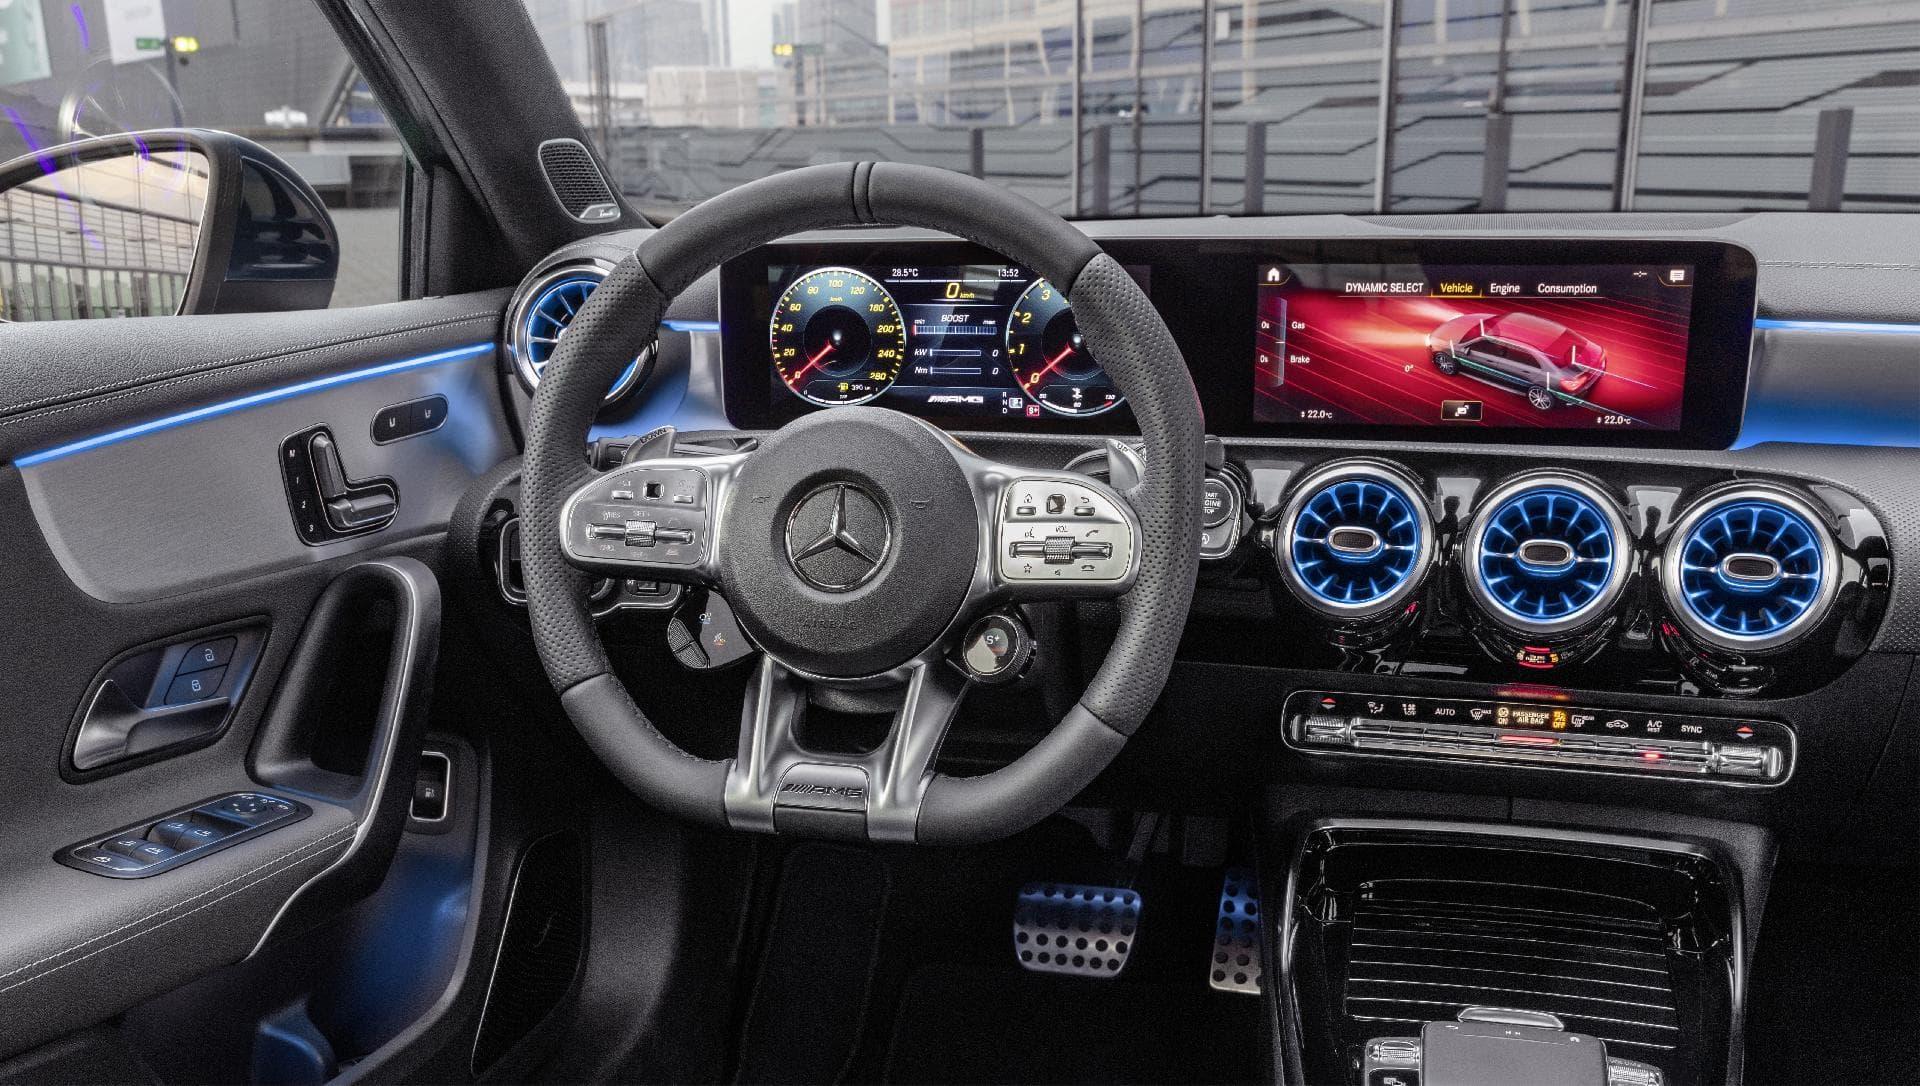 Mercedes Amg A35 Sedan 19c0171 070